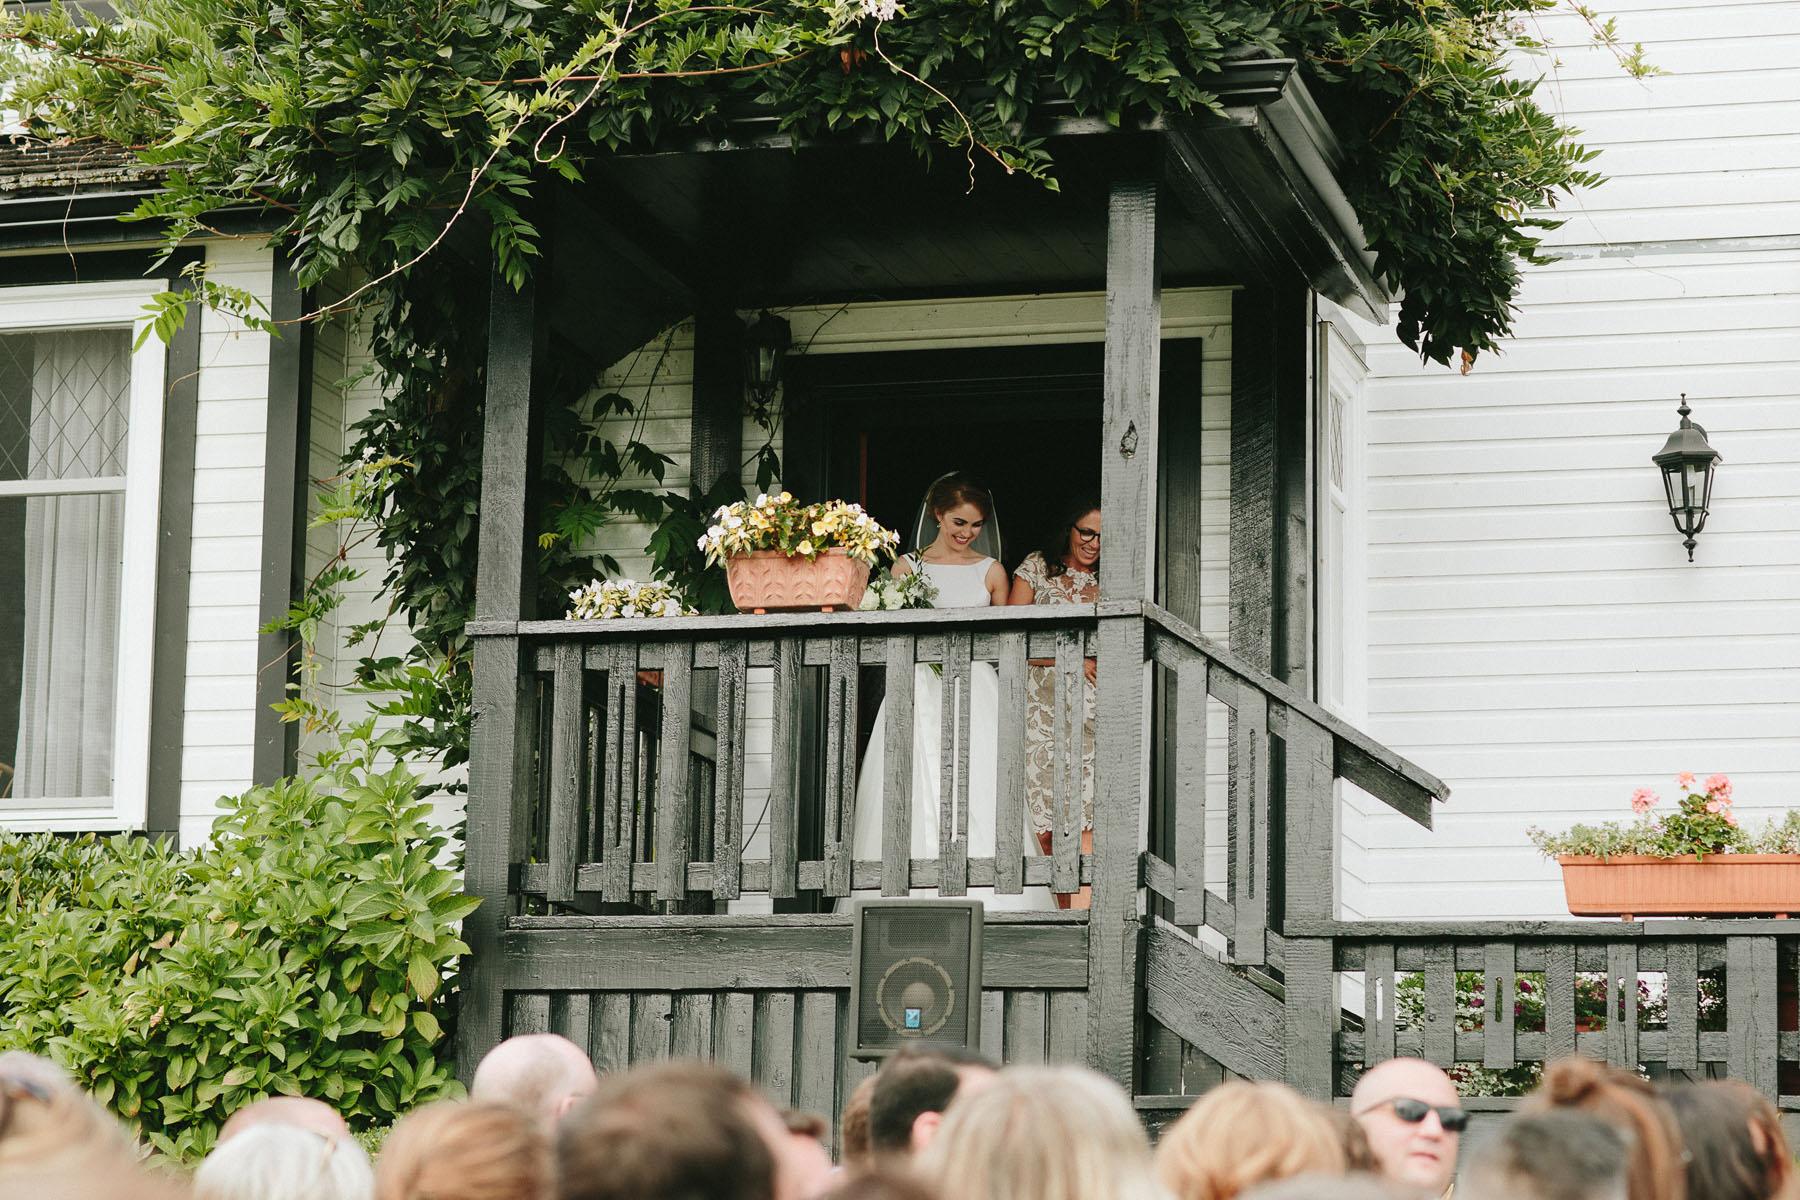 thetis-island-wedding-photographer-rp-rn-069.jpg